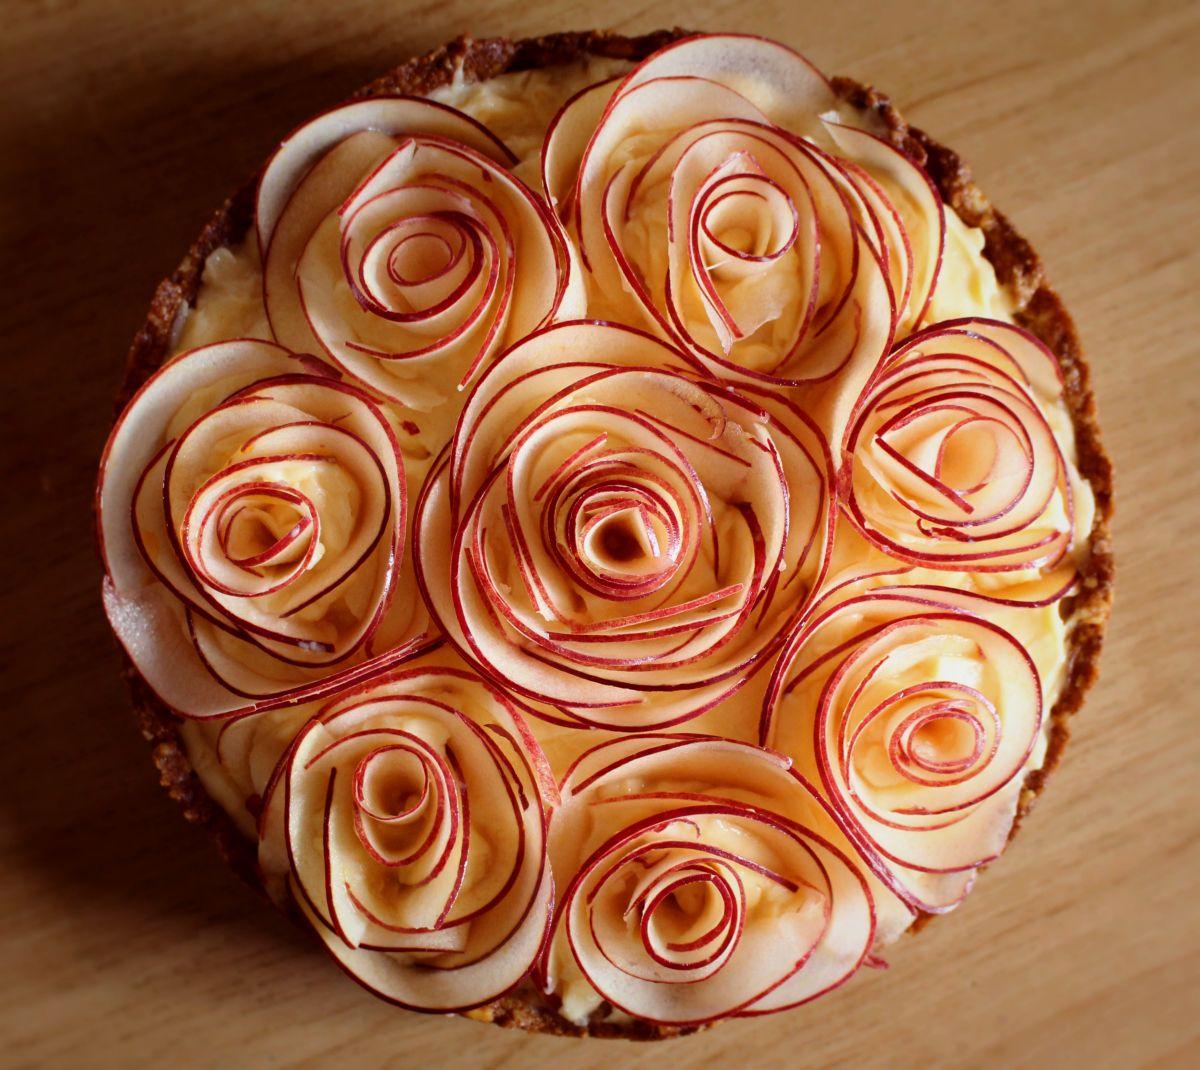 Rosen-Apfelkuchen Nr. 2 #blätterteigrosenmitapfel